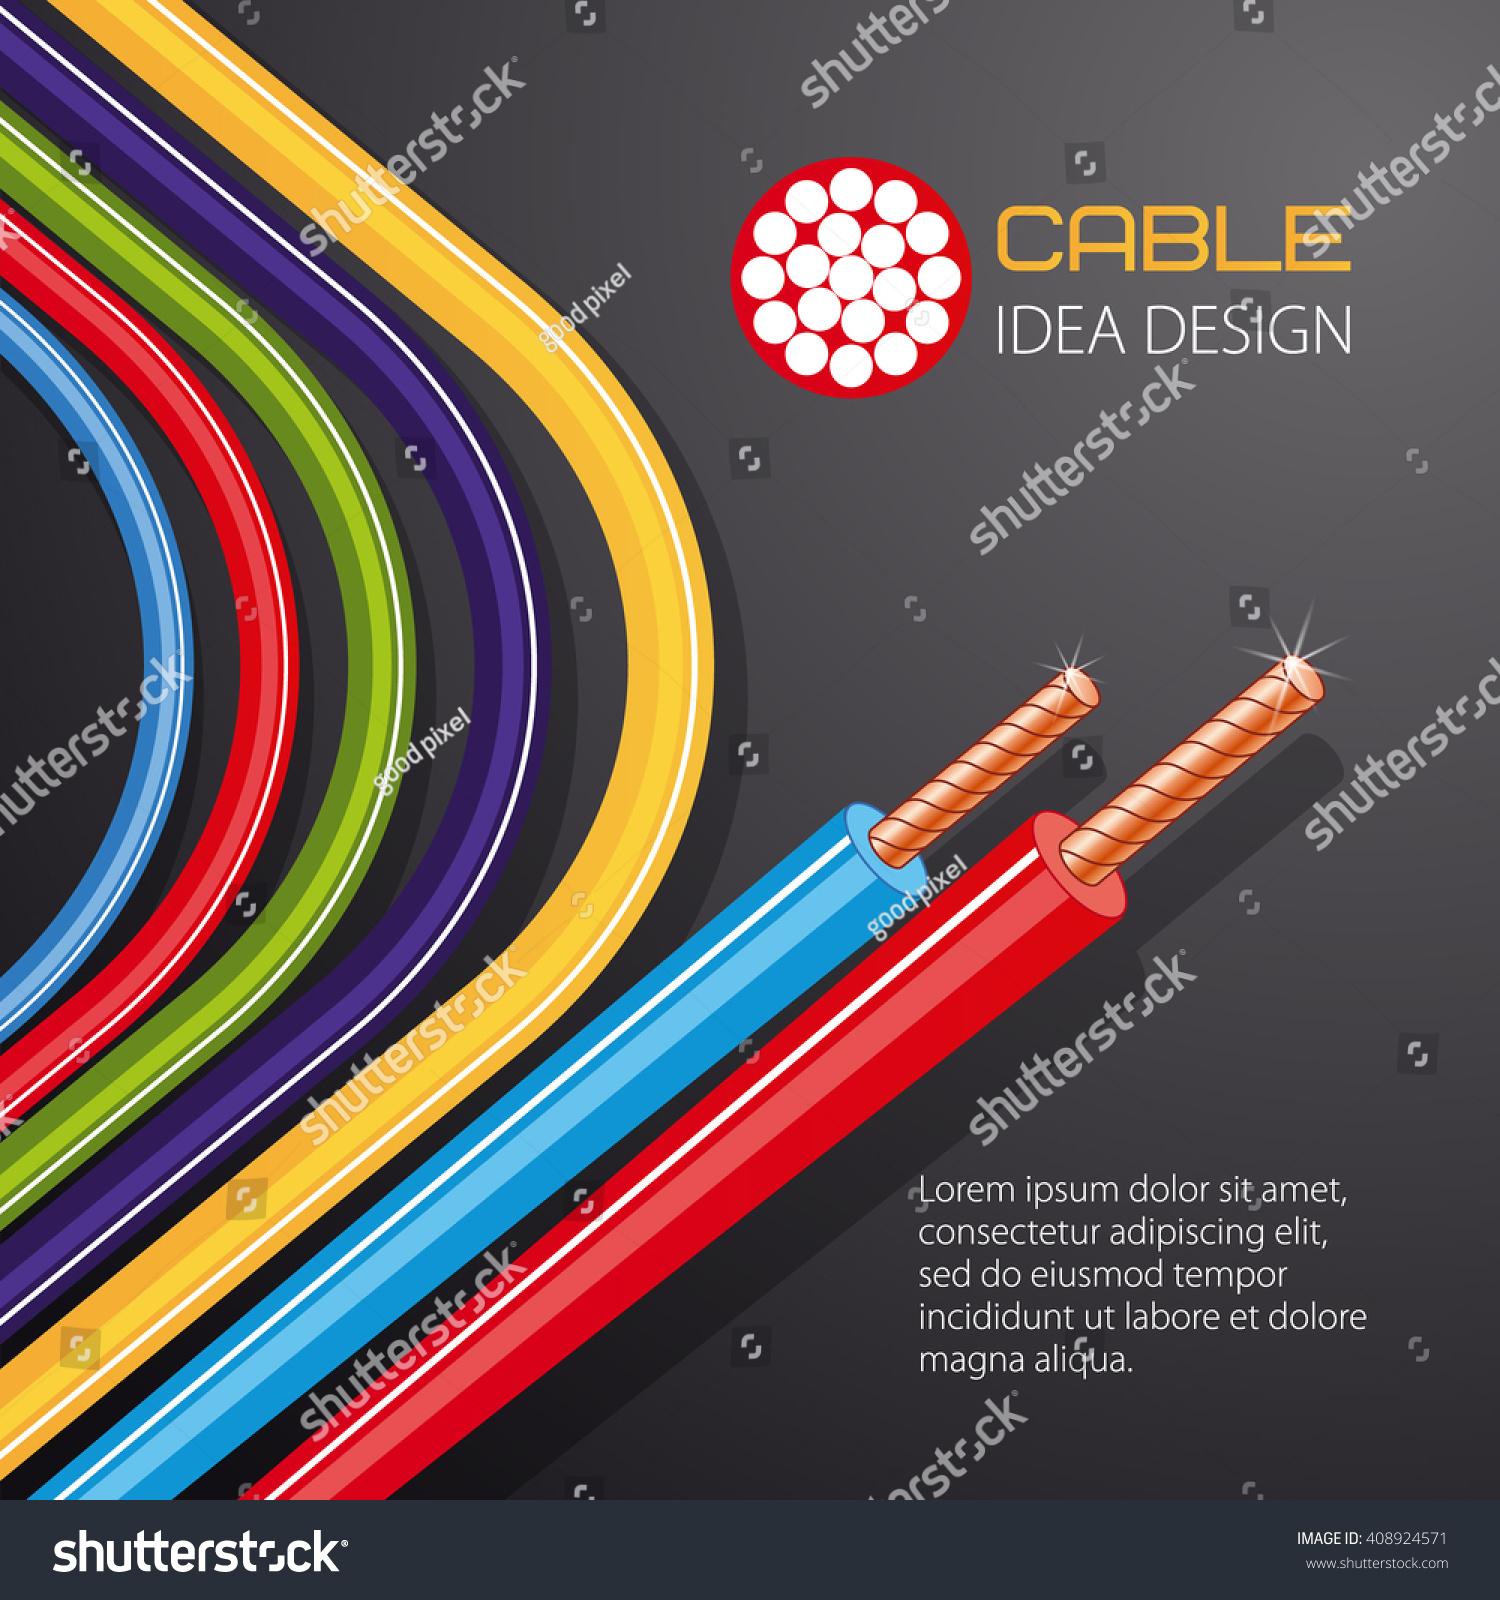 Cable Wire Vector Design Stock Photo (Photo, Vector, Illustration ...